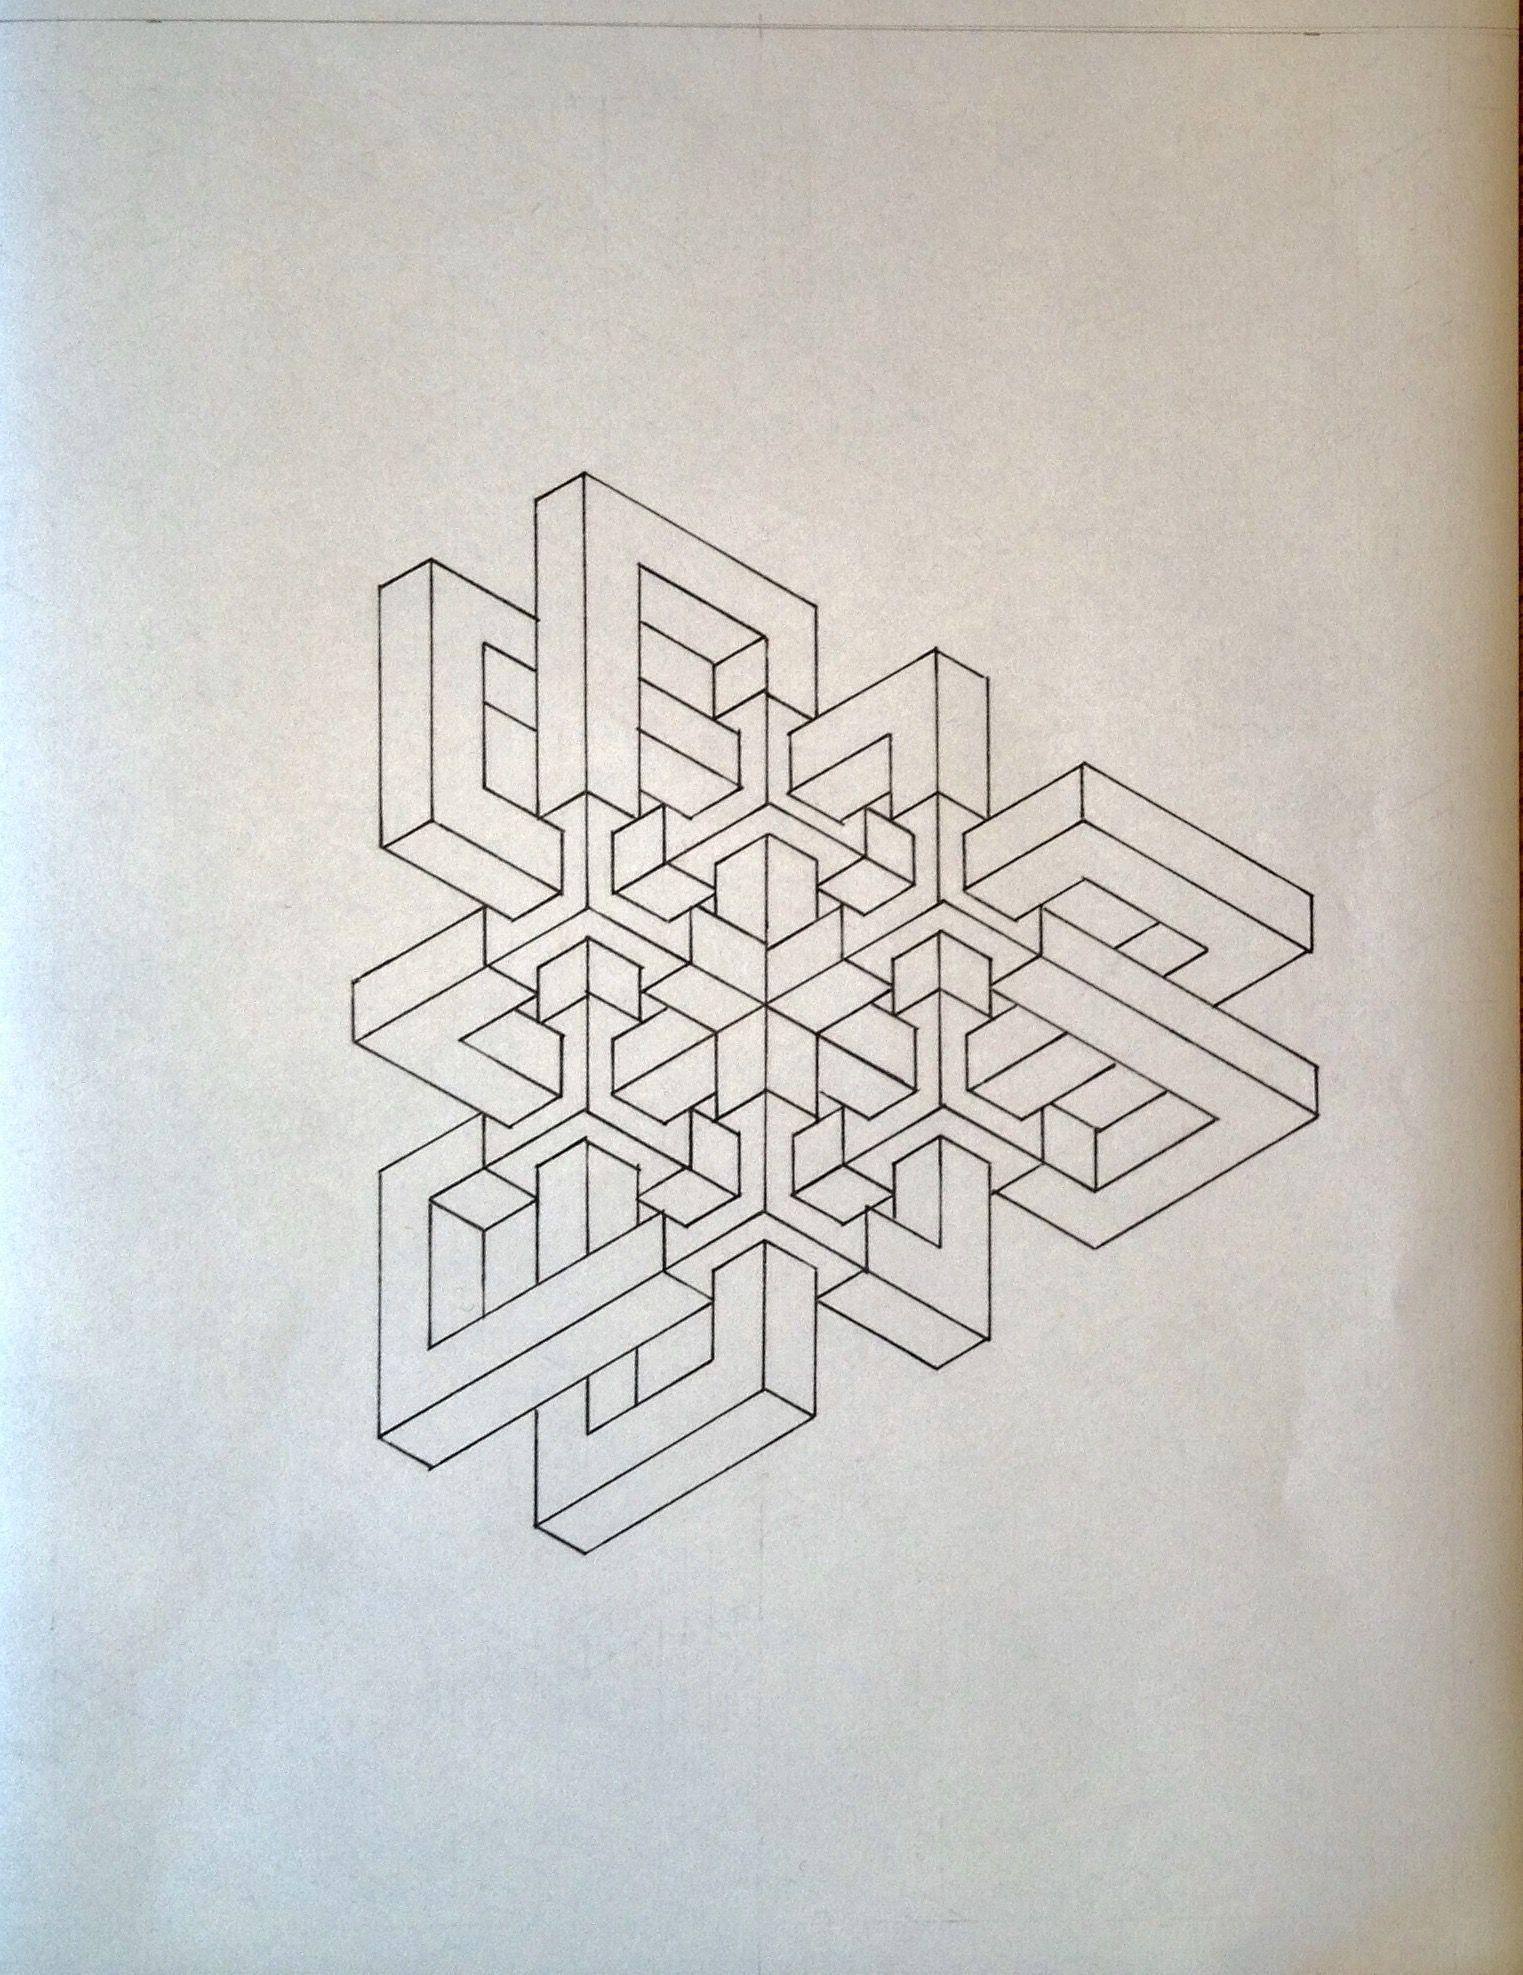 #impossible #isometric #geometry #symmetry #pattern #handmade #oscarreutersvärd #Escher #mathart #regolo54 #opticalillusion #penrosetriangle